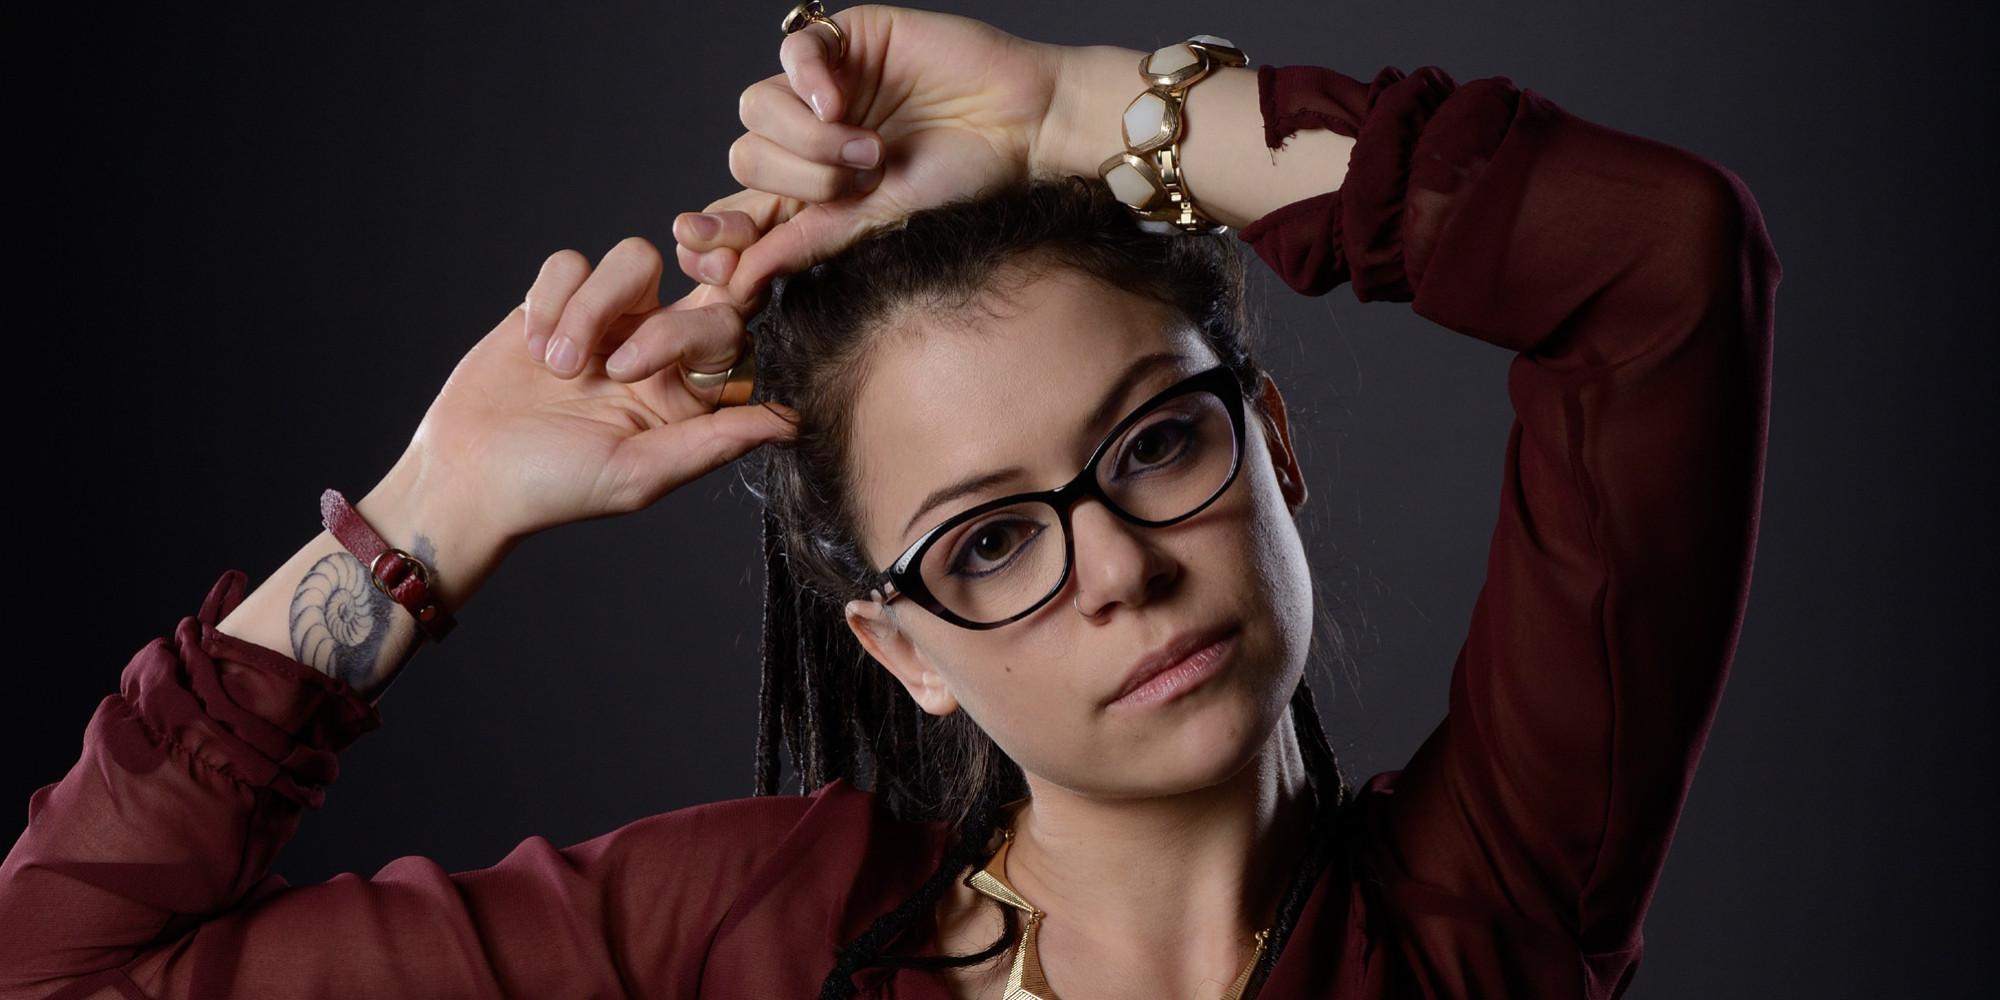 tattoo ref | Orphan Black Cosplay project: Cosima Niehaus ...